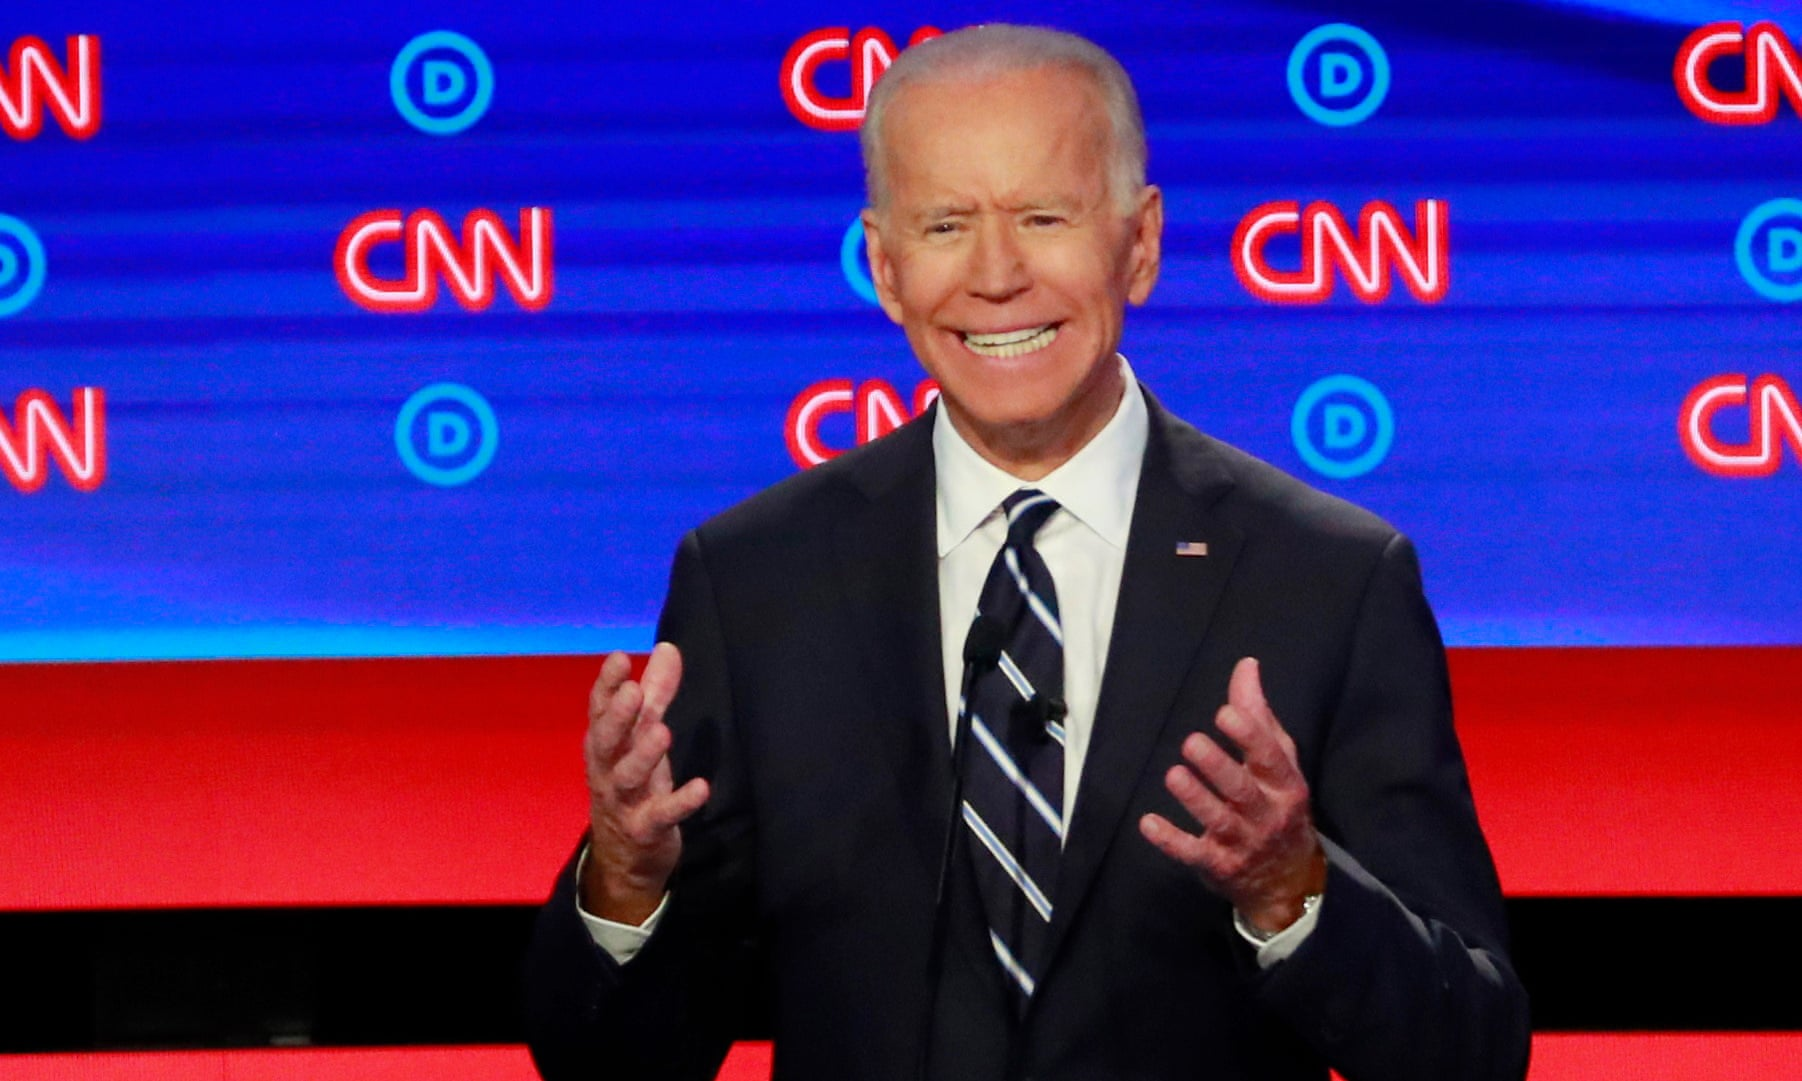 The More Joe Biden Stumbles, the More Corporate Democrats Freak Out -  Random Lengths News